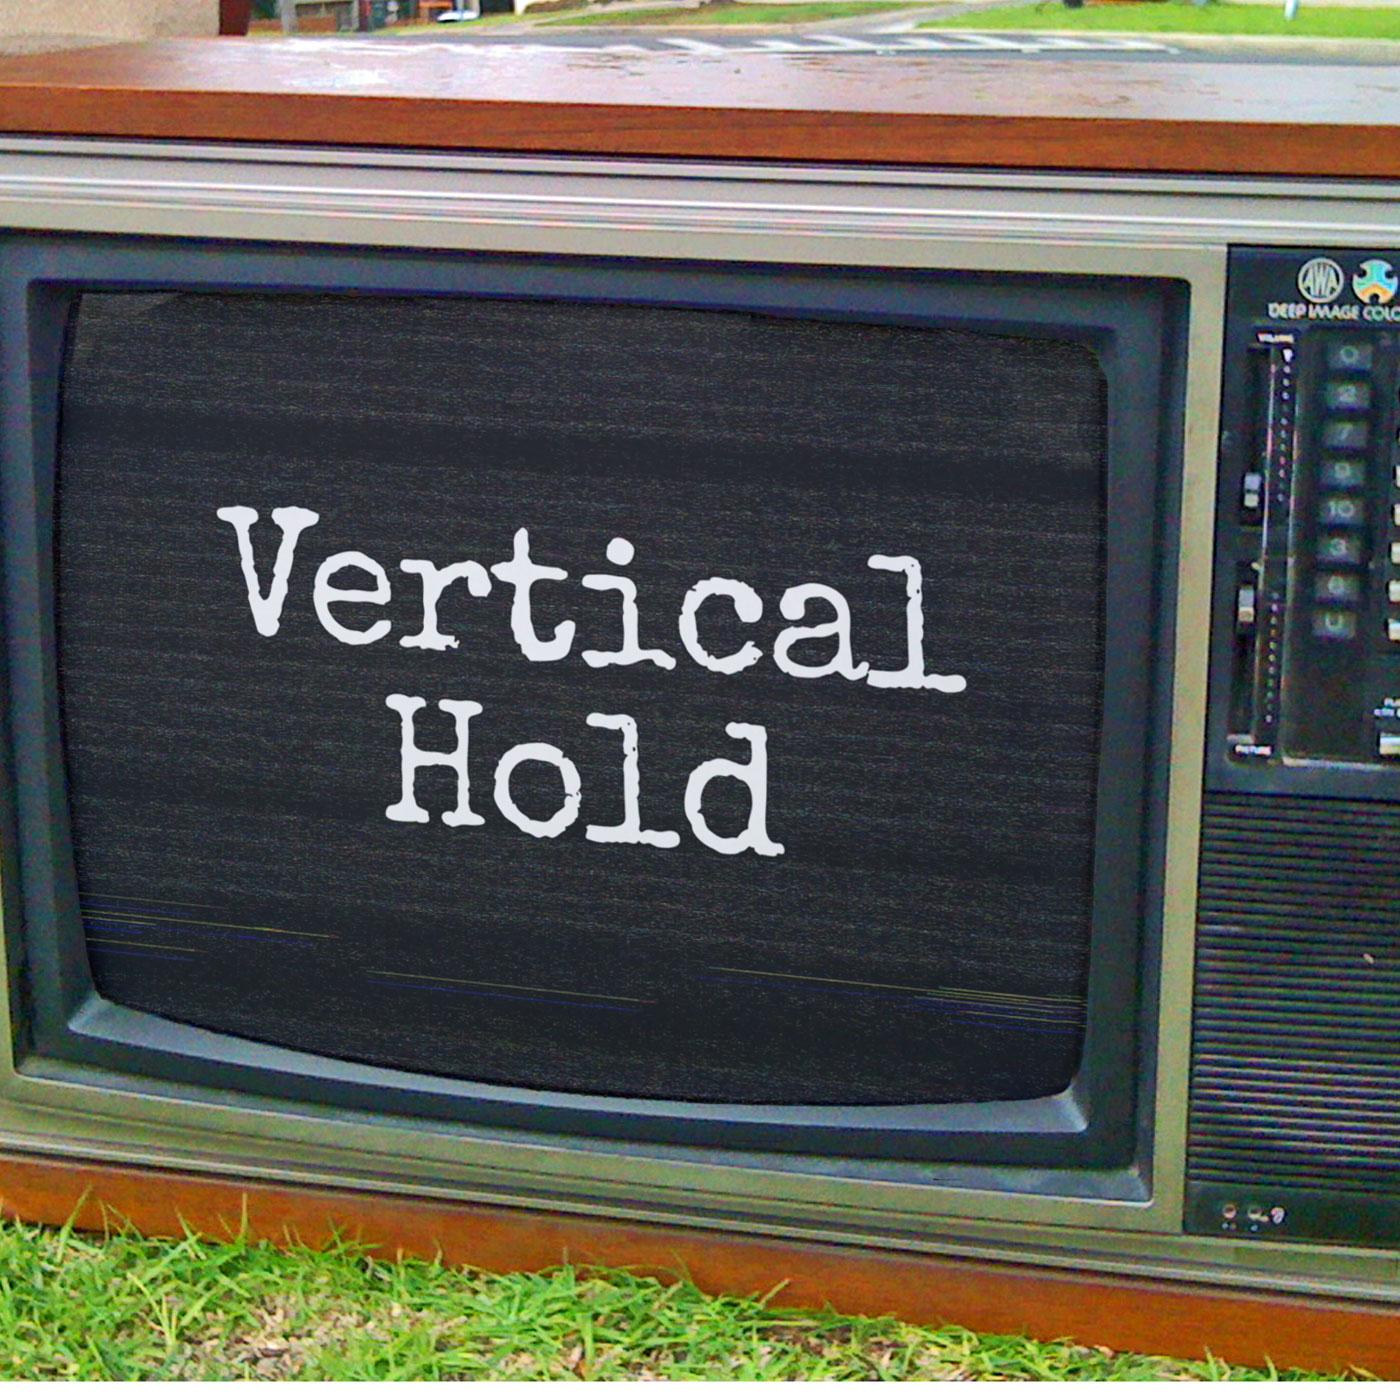 Artwork for Hyperloop Space X Challenge and Battery Warranties: Vertical Hold Episode 103